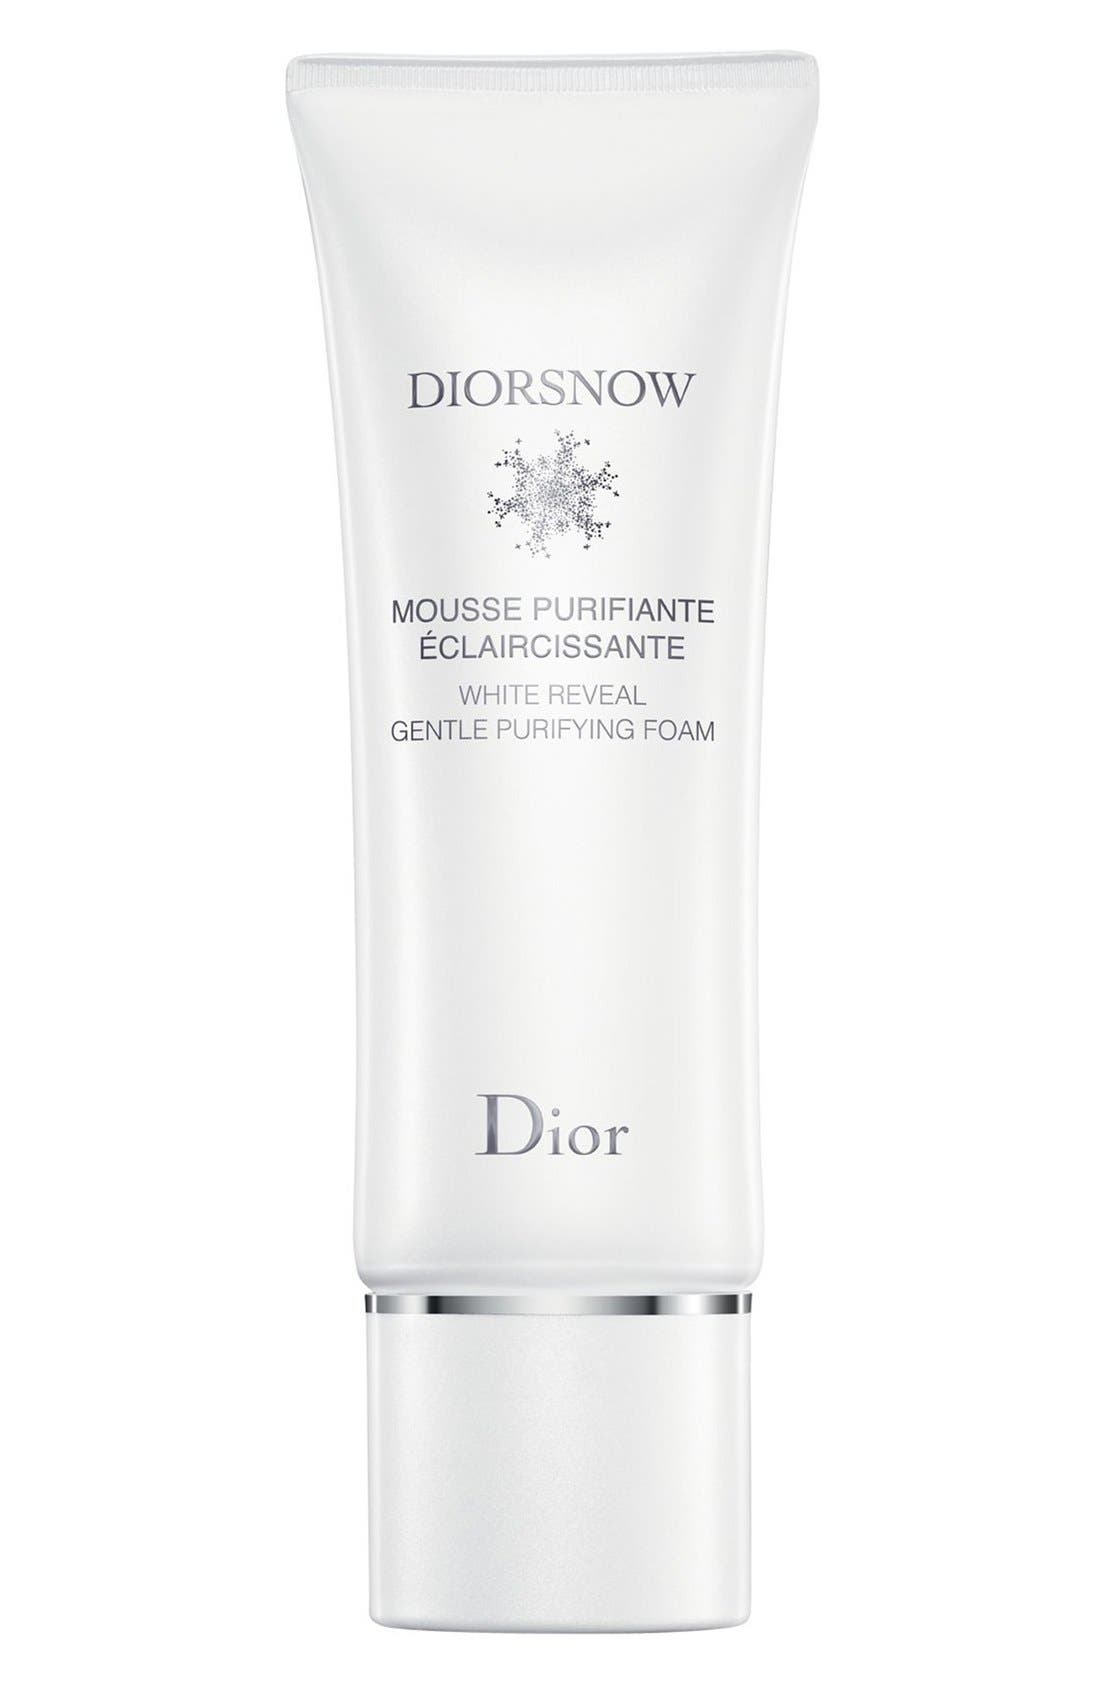 Diorsnow White Reveal Gentle Purifying Foam,                             Main thumbnail 1, color,                             NO COLOR